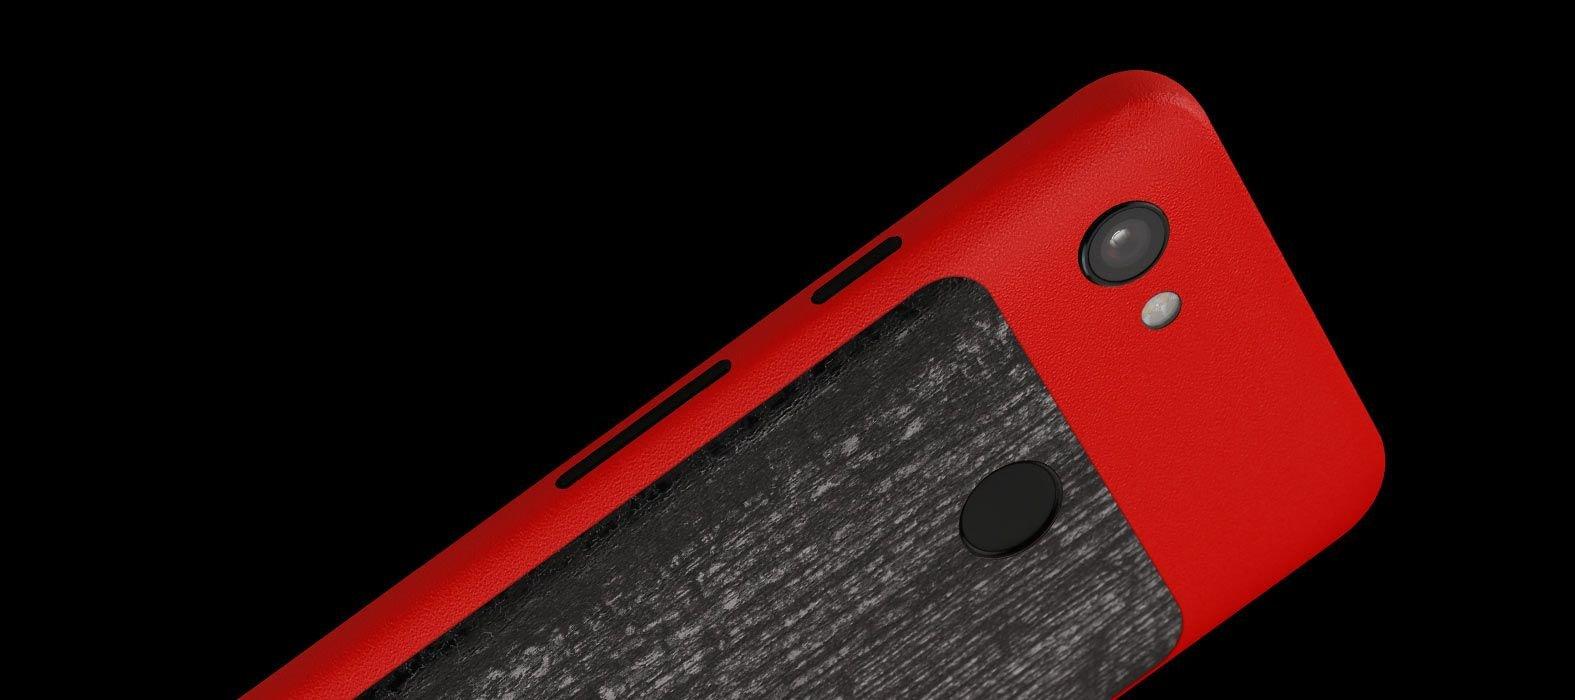 Pixel-3A_Red Sandstone_with_Raptor_Skins